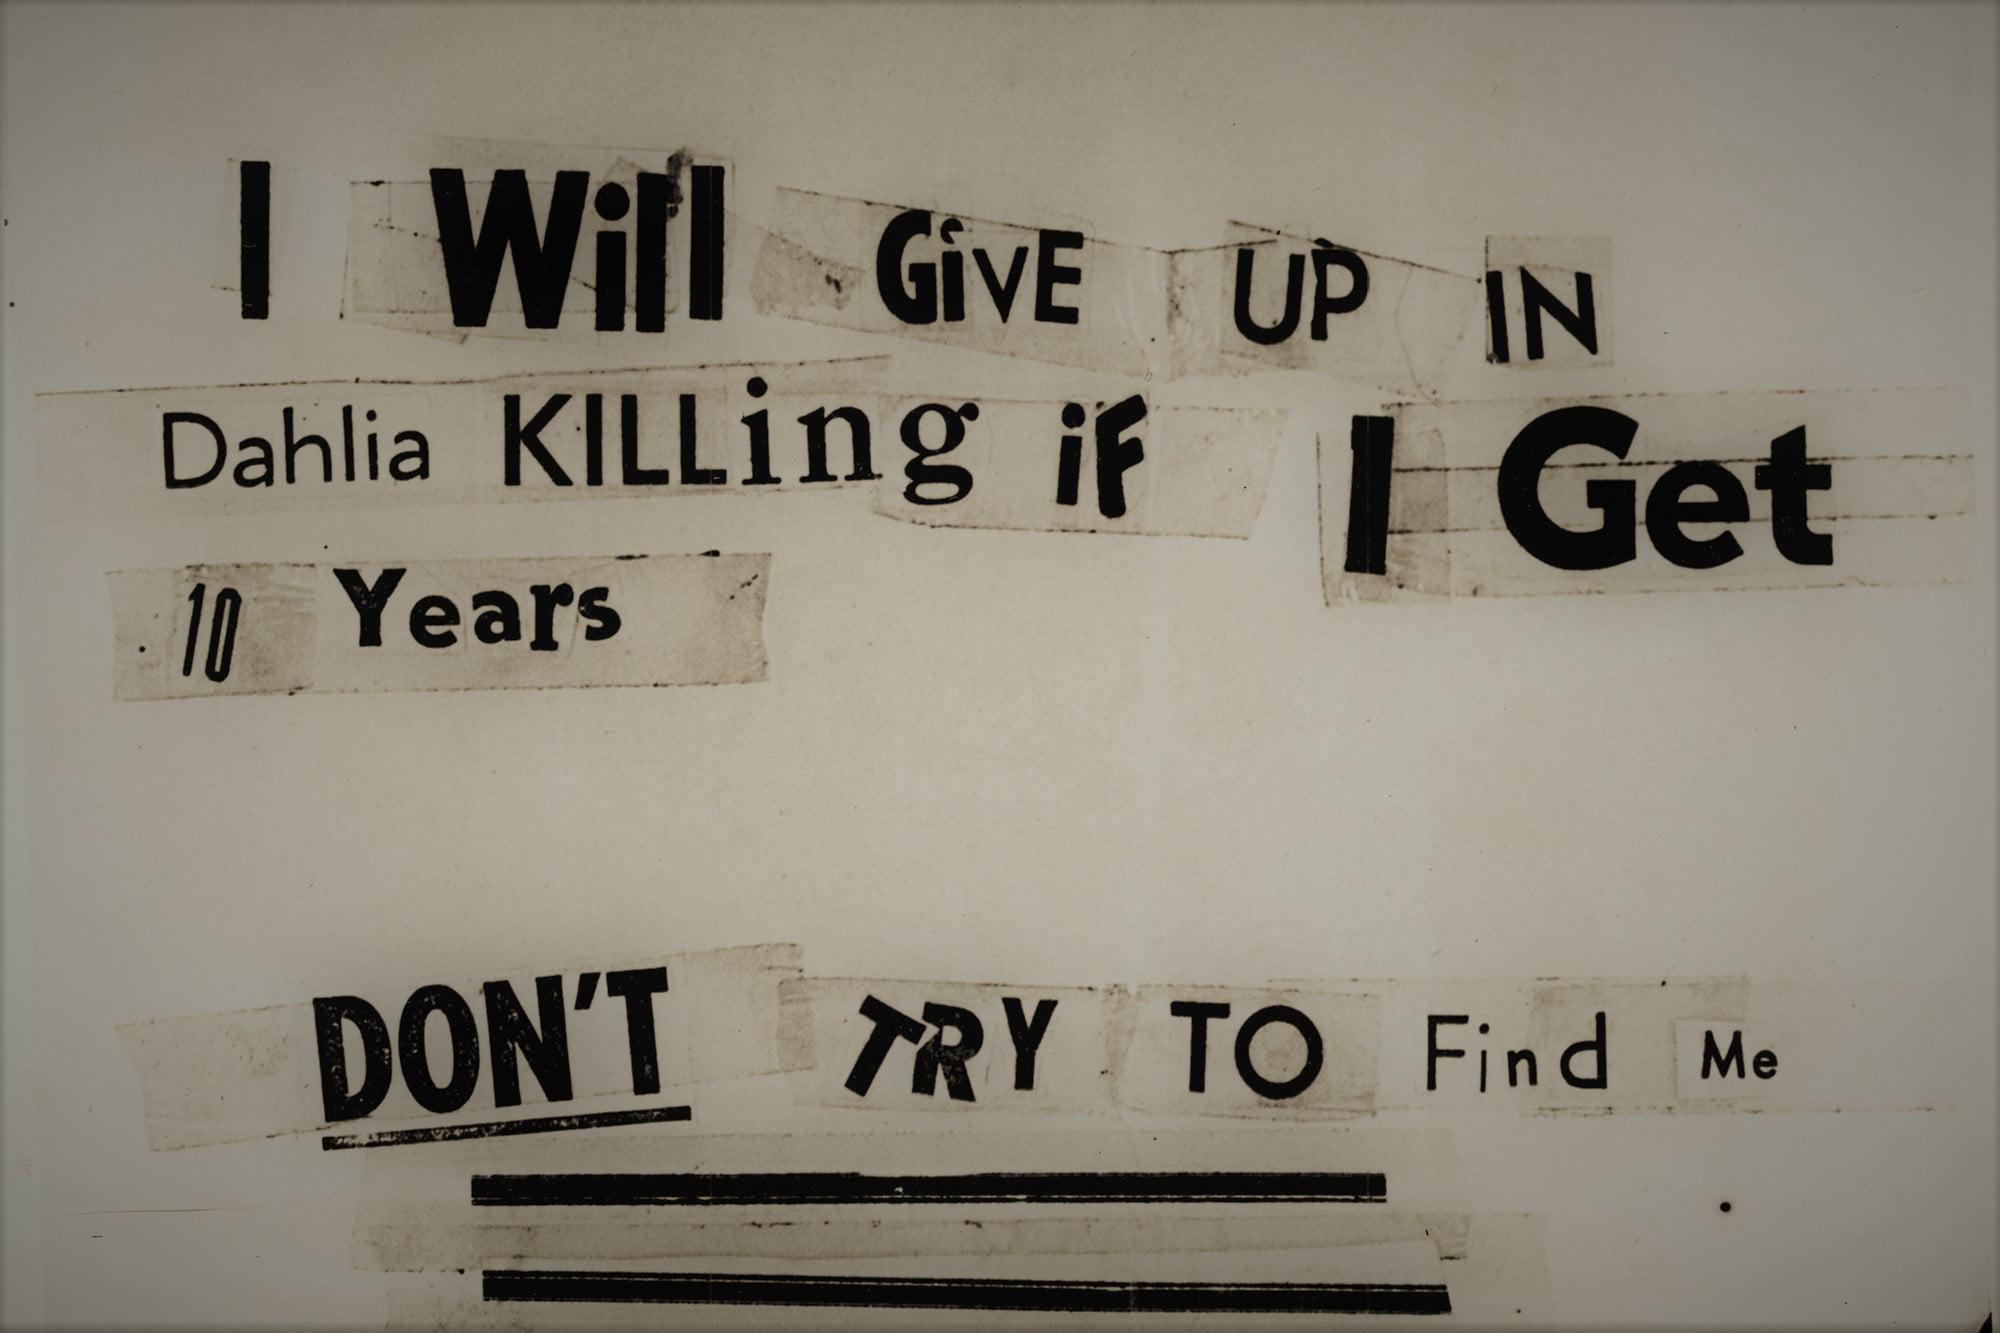 Black Dhalia Avenger - listy od zabójcy